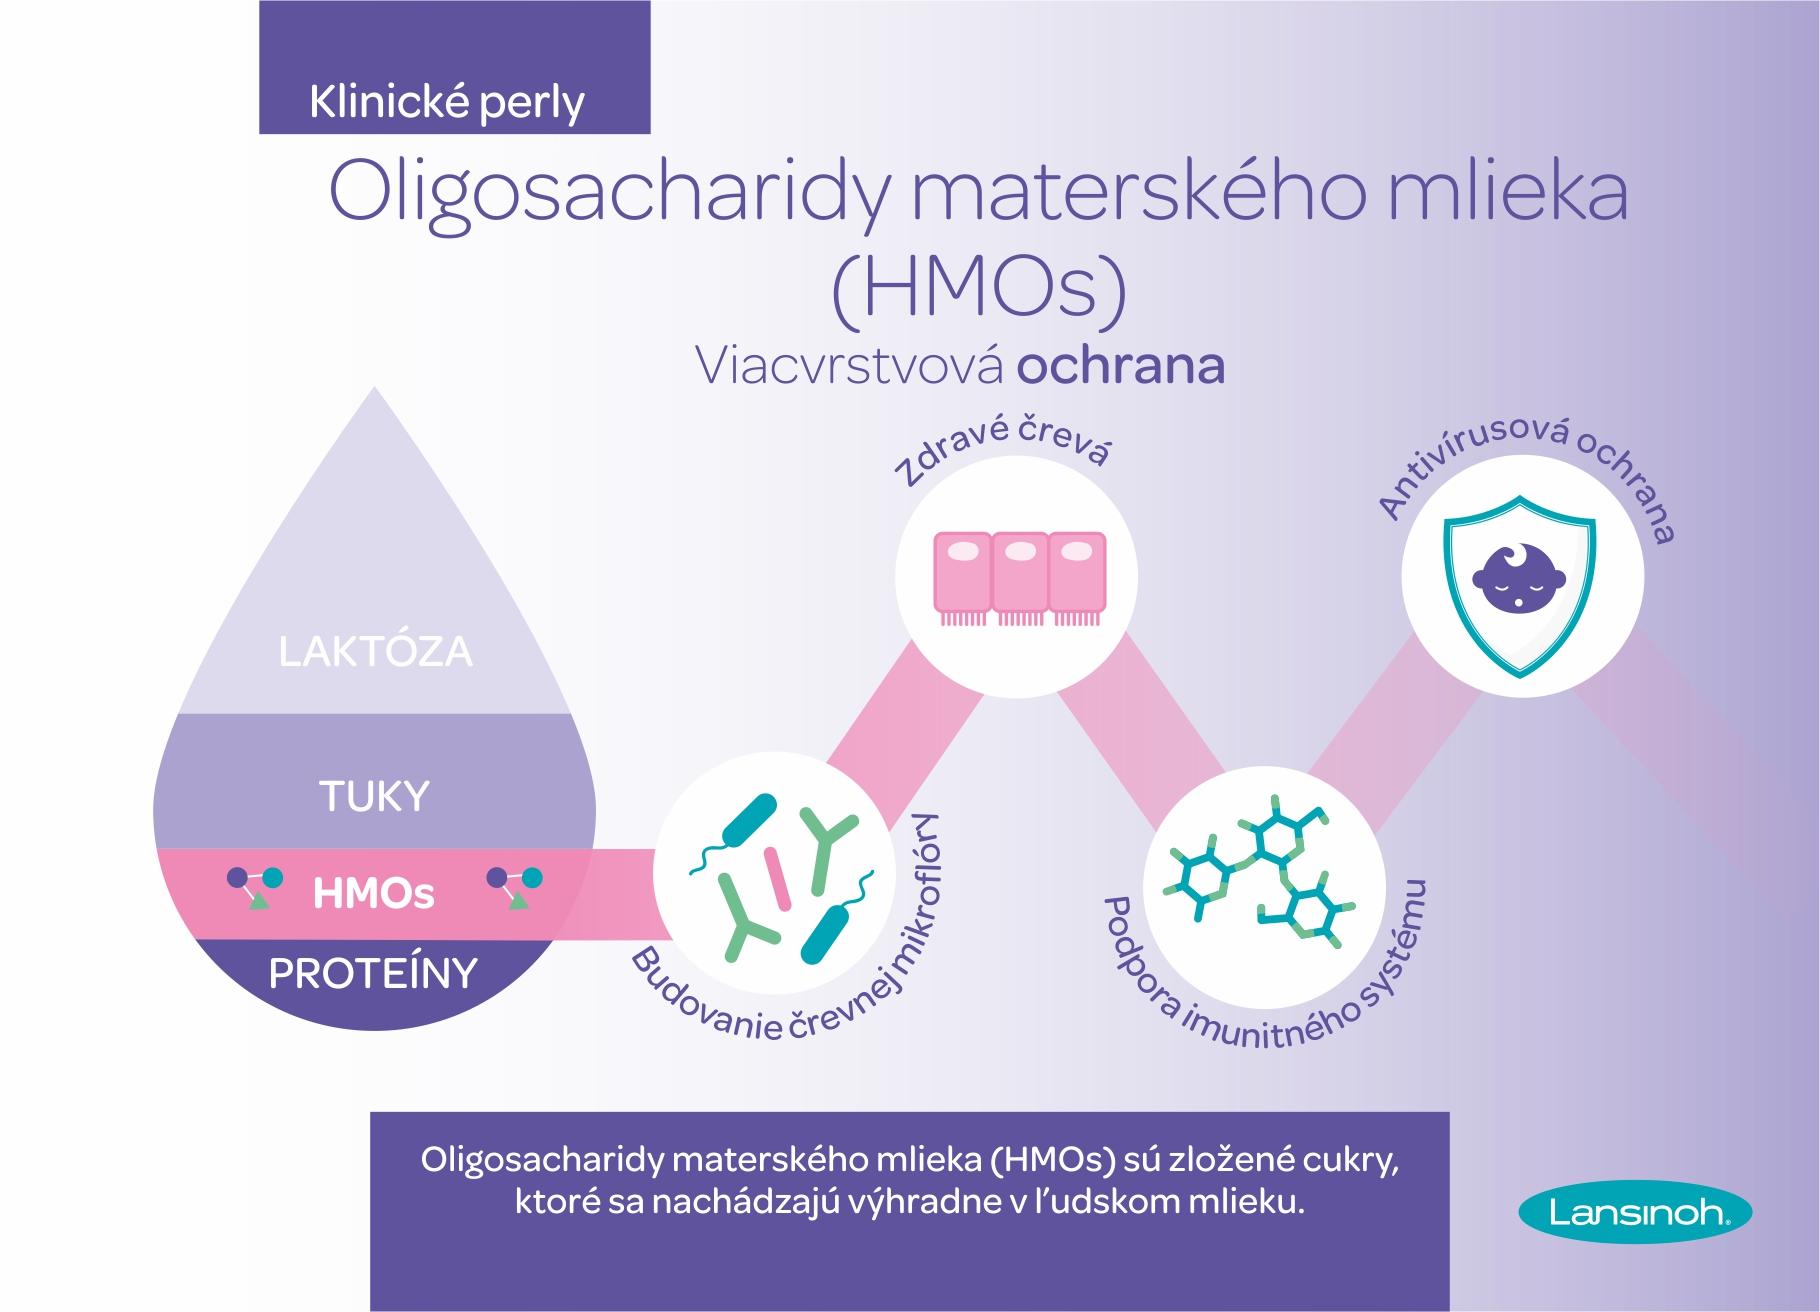 Oligosacharidy materského mlieka HMOs